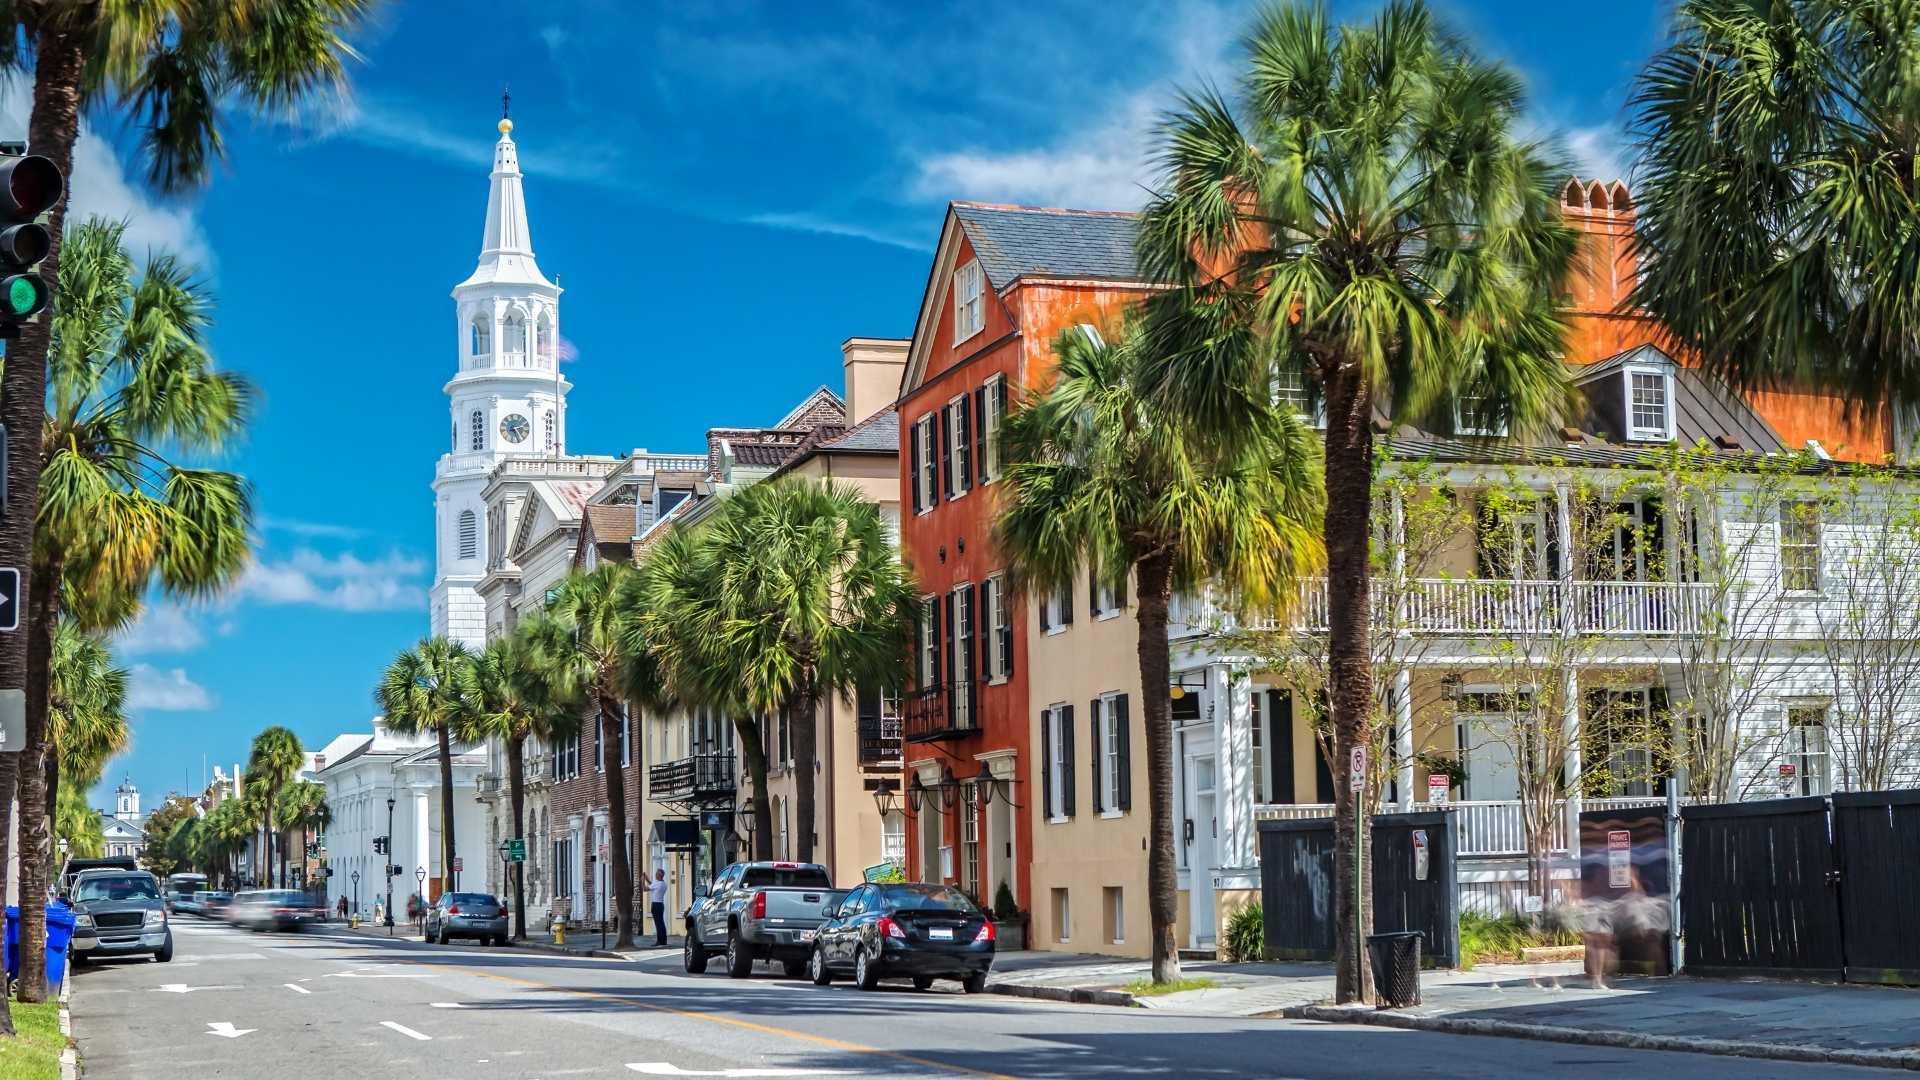 Friends road trip to Charleston South Carolina